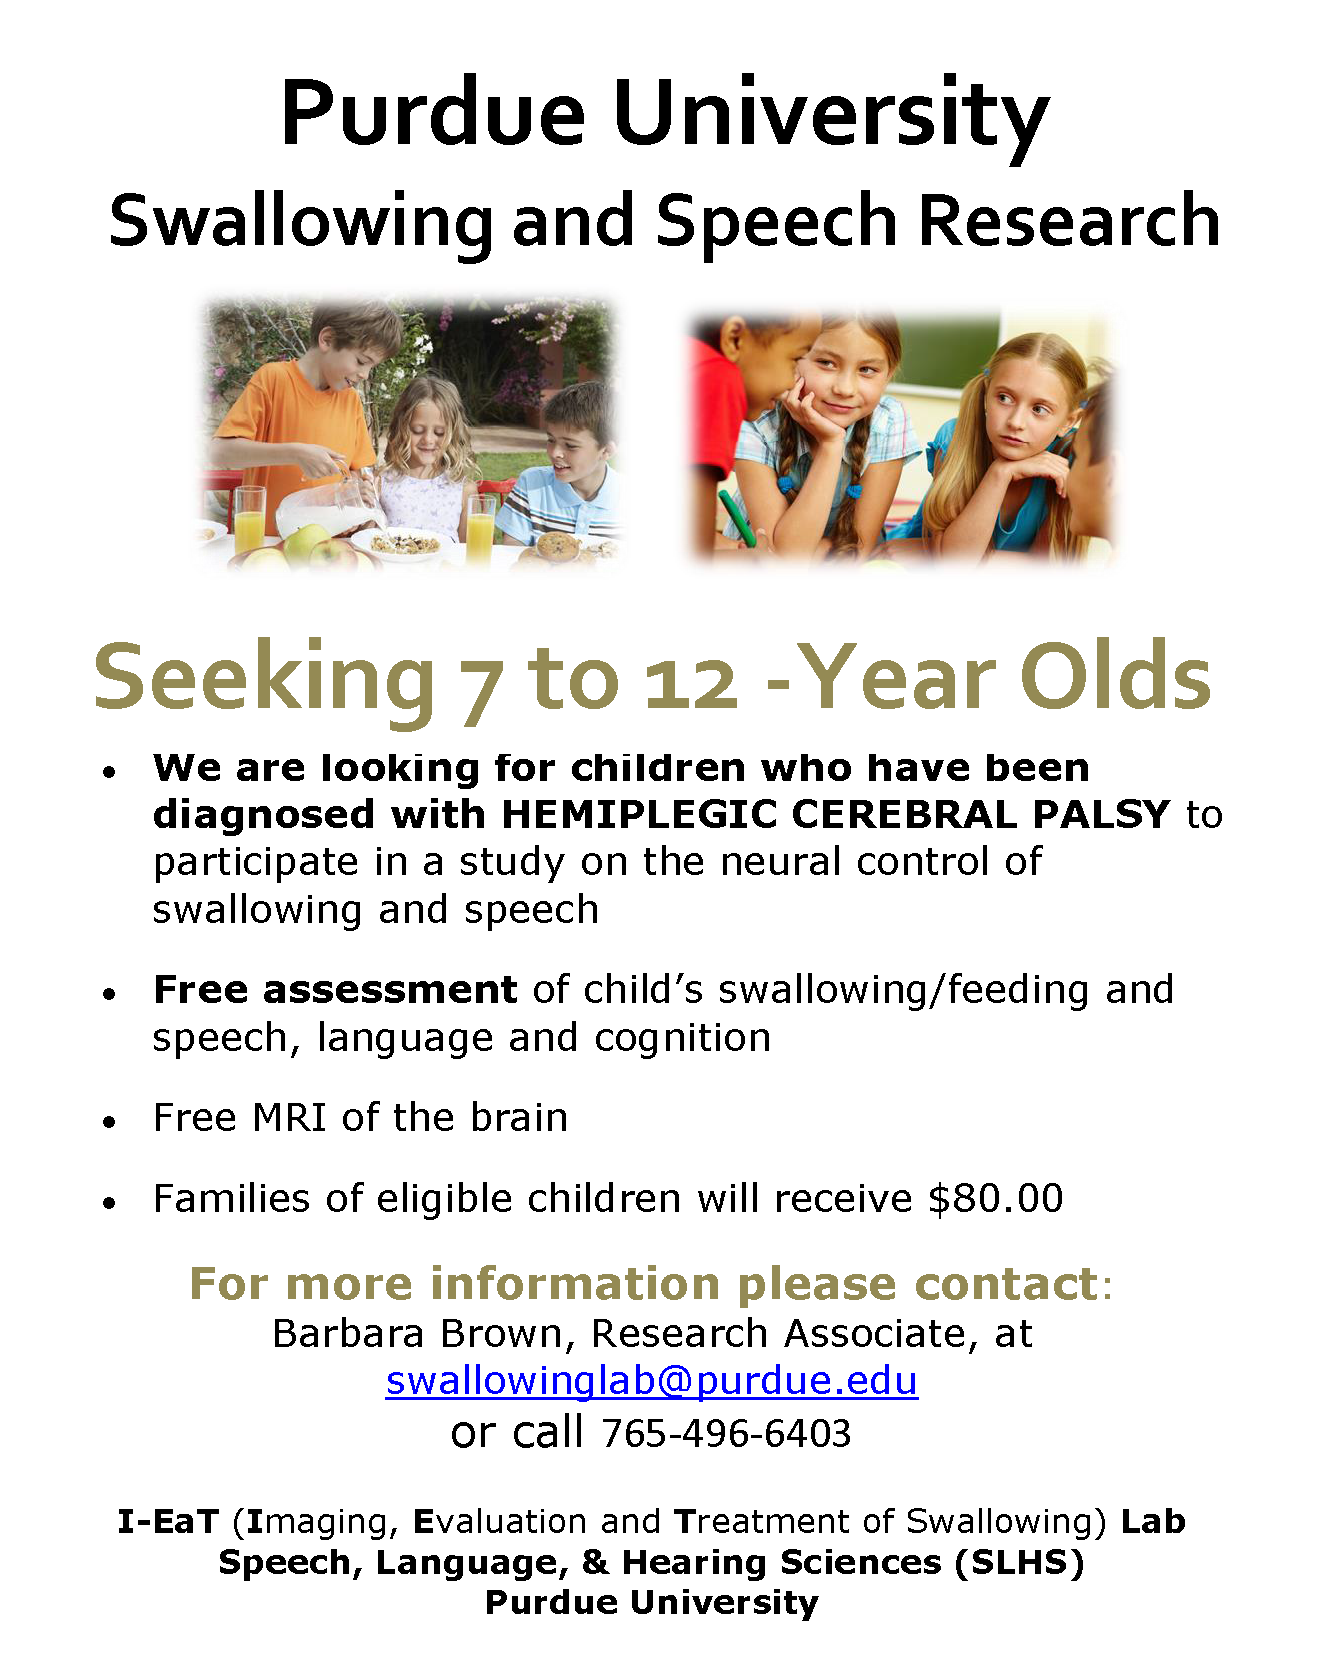 Research Seeking Participants – Children with Hemiplegia